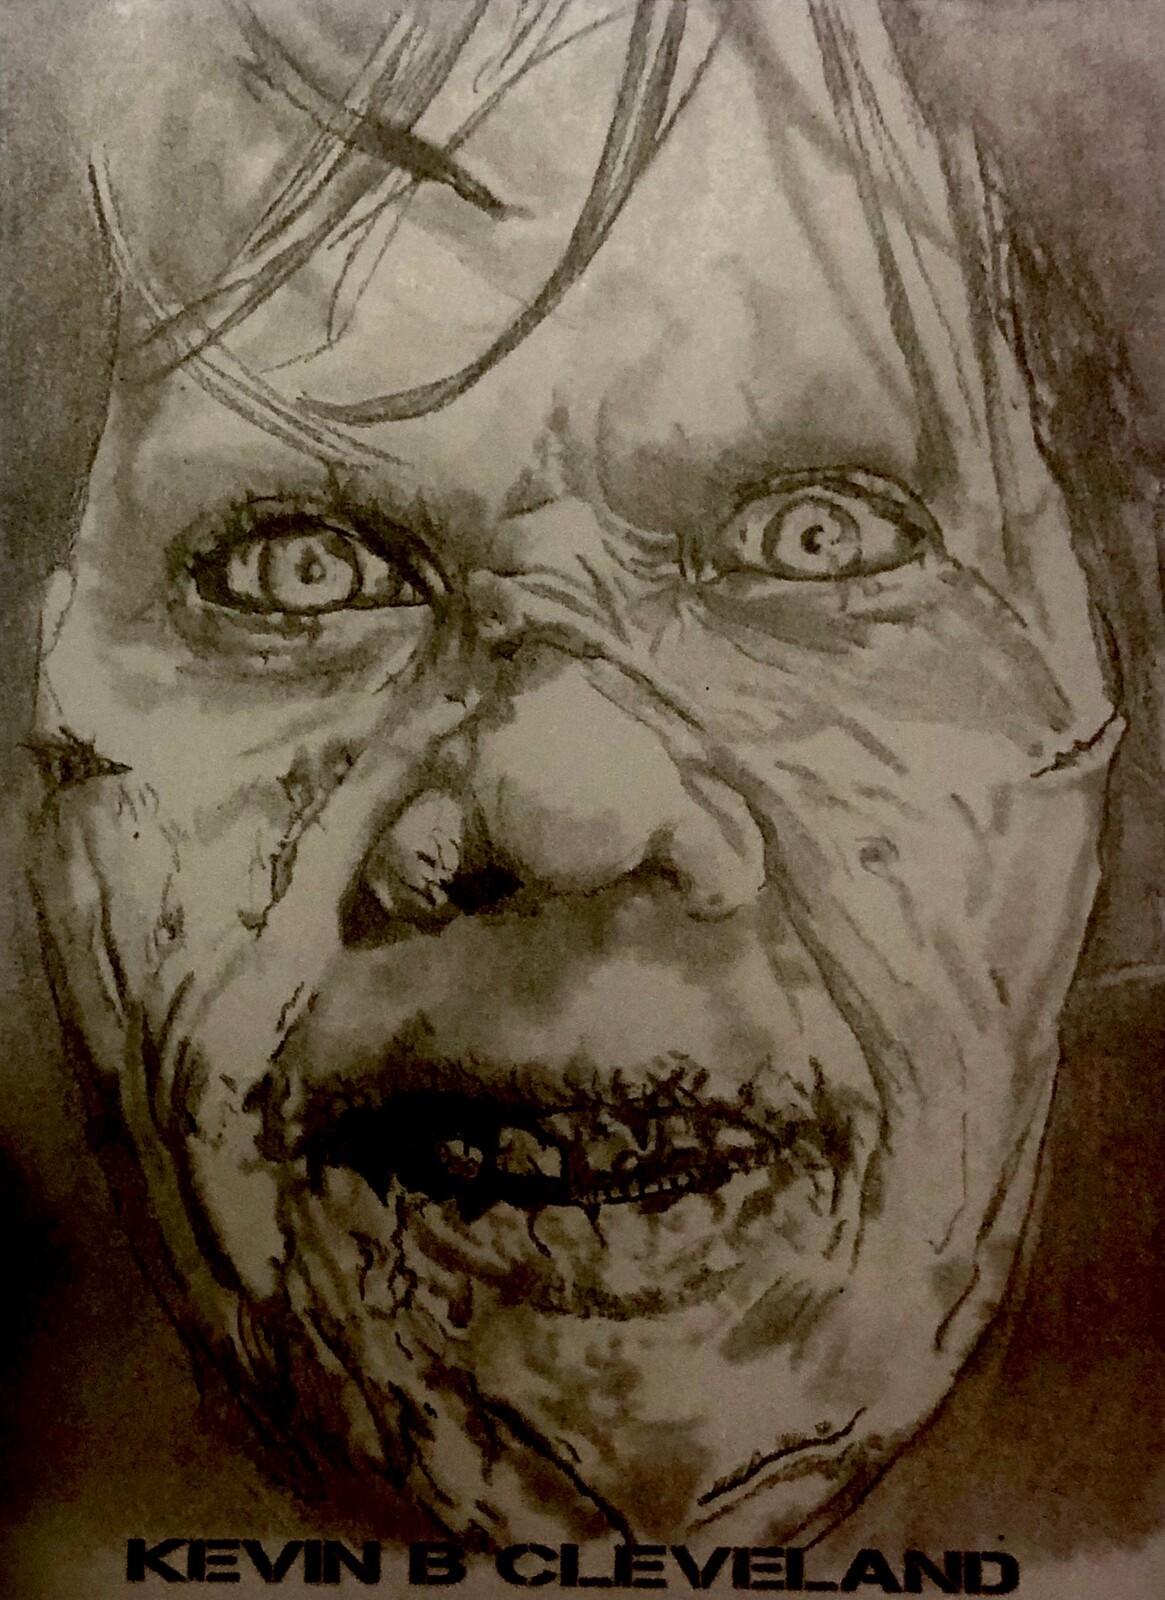 Regan - The Exorcist